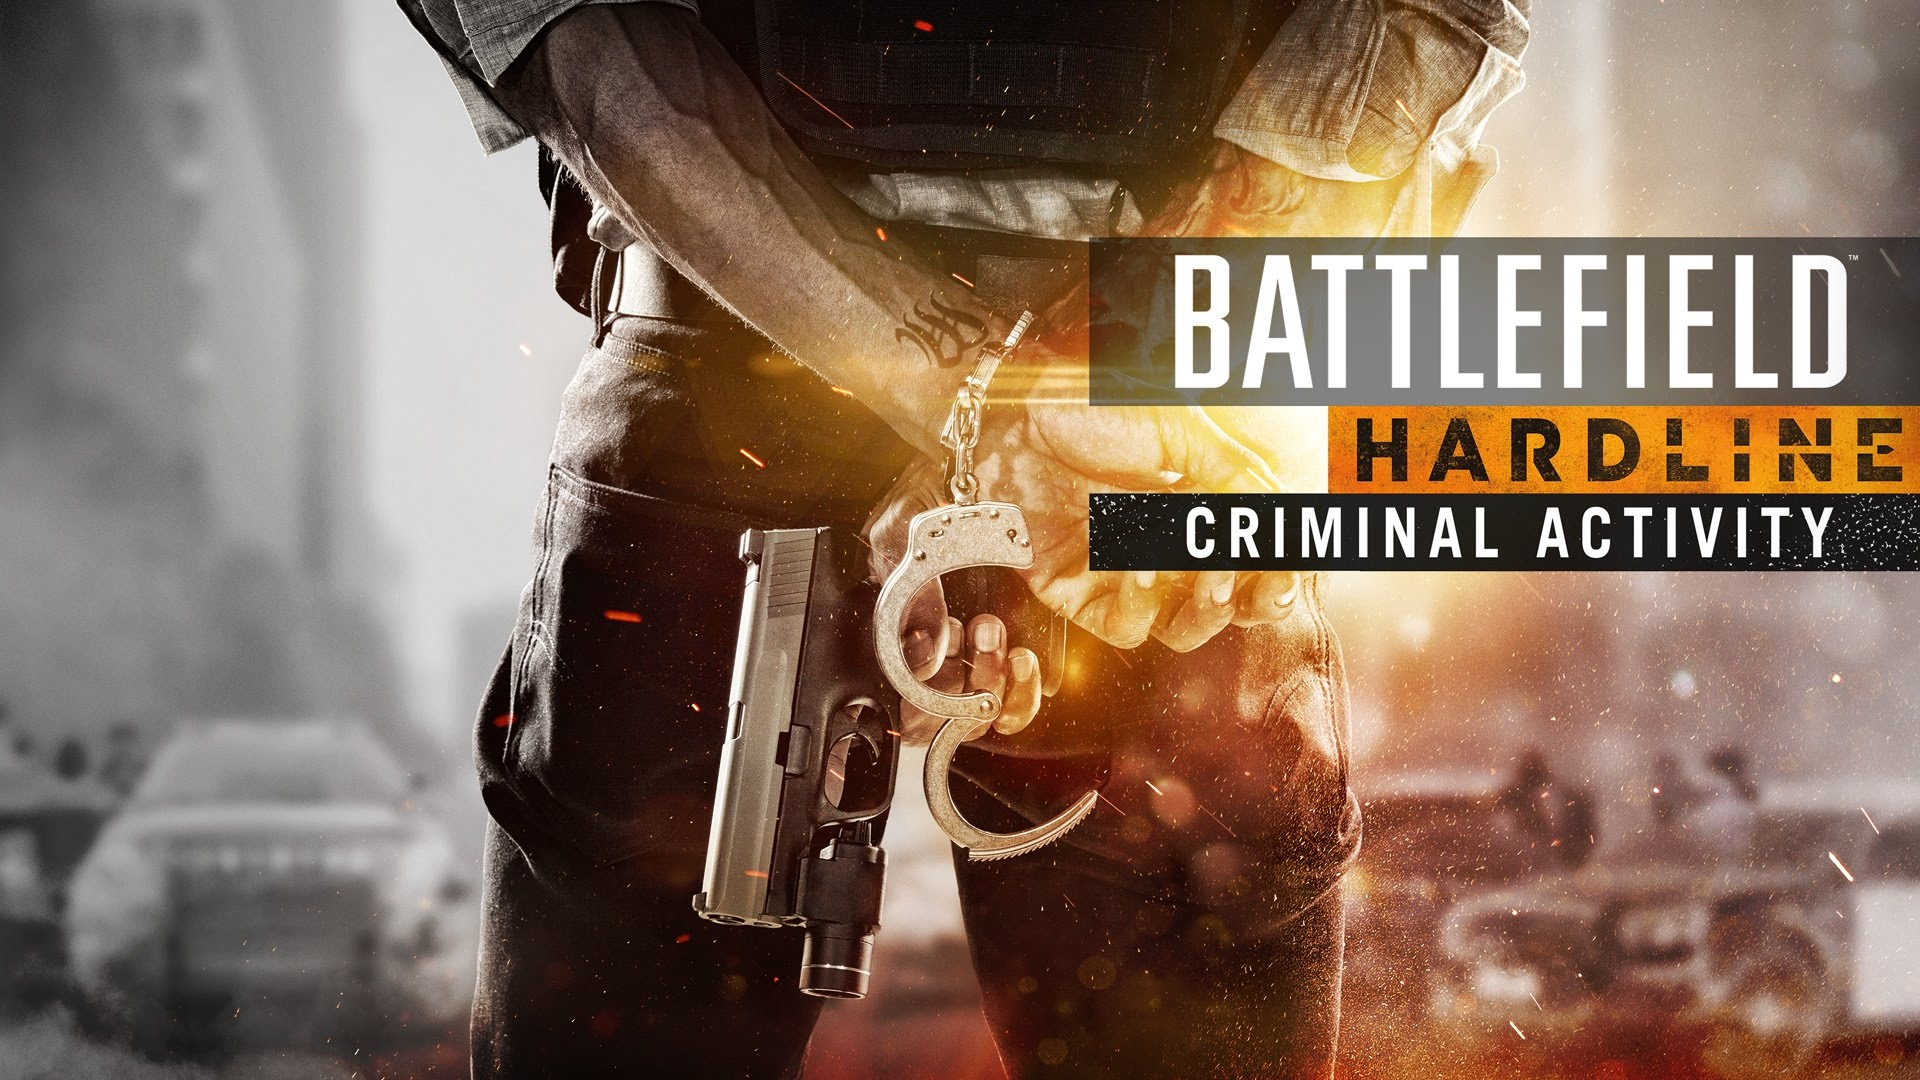 Battlefield Hardline Full Hd Fond D 39 Cran And Arri Re Plan